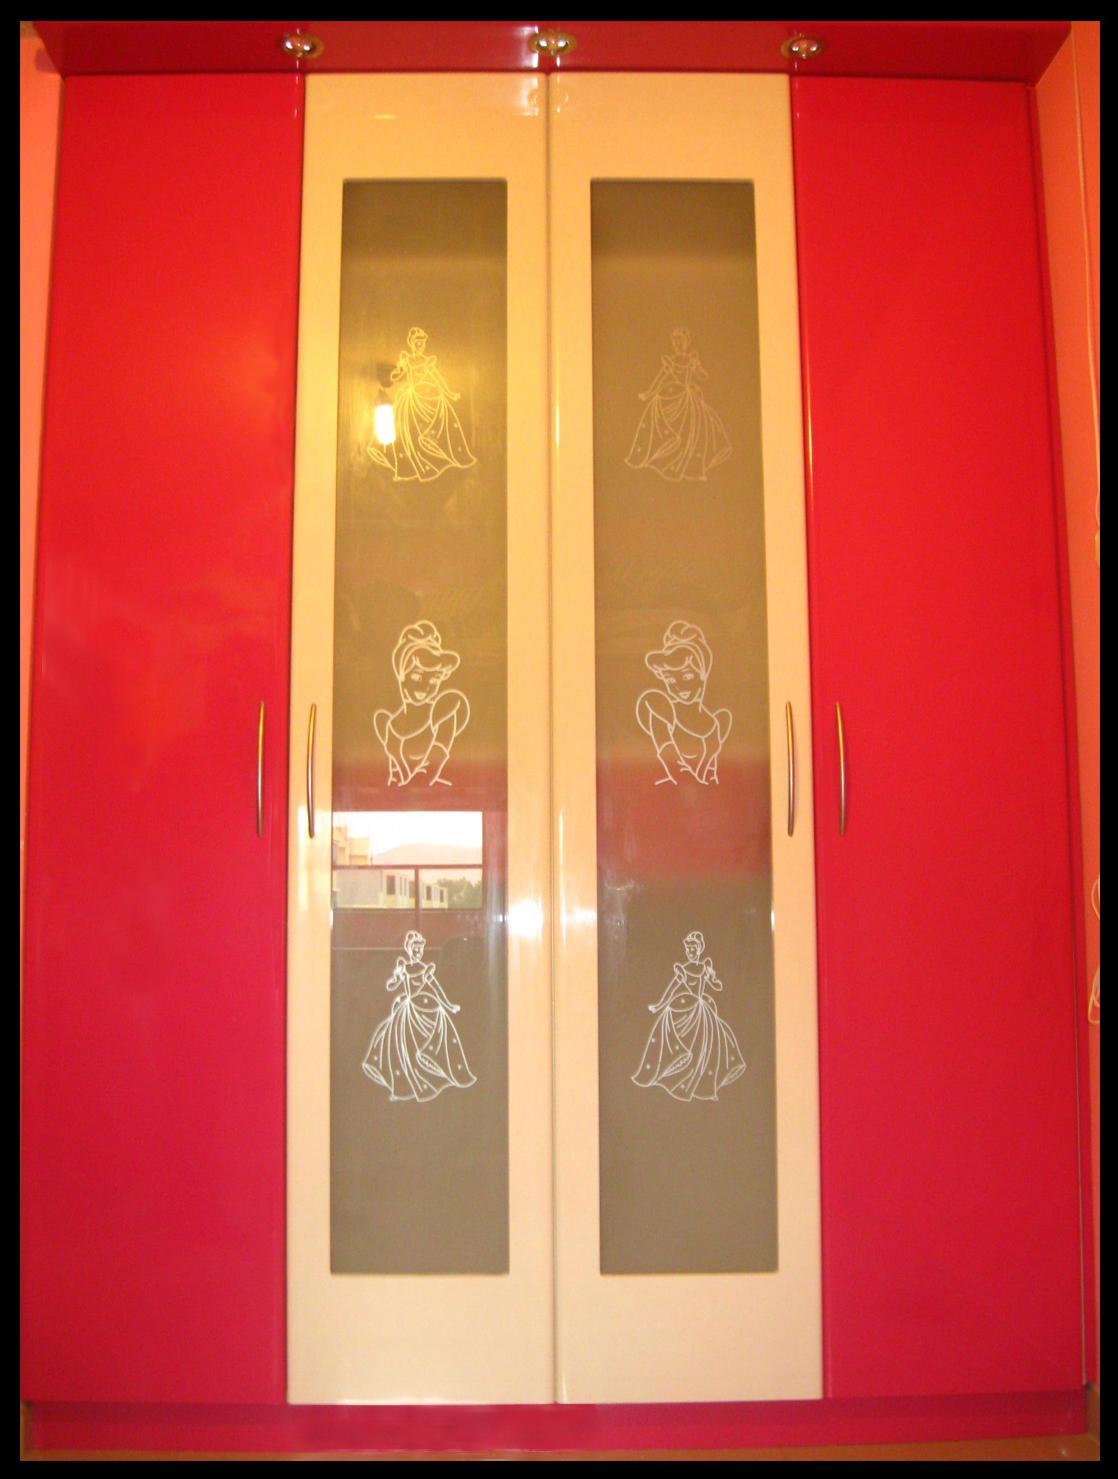 Muebles jose luis chingay closet exclusivo a1 modelo for Modelos de puertas para closet